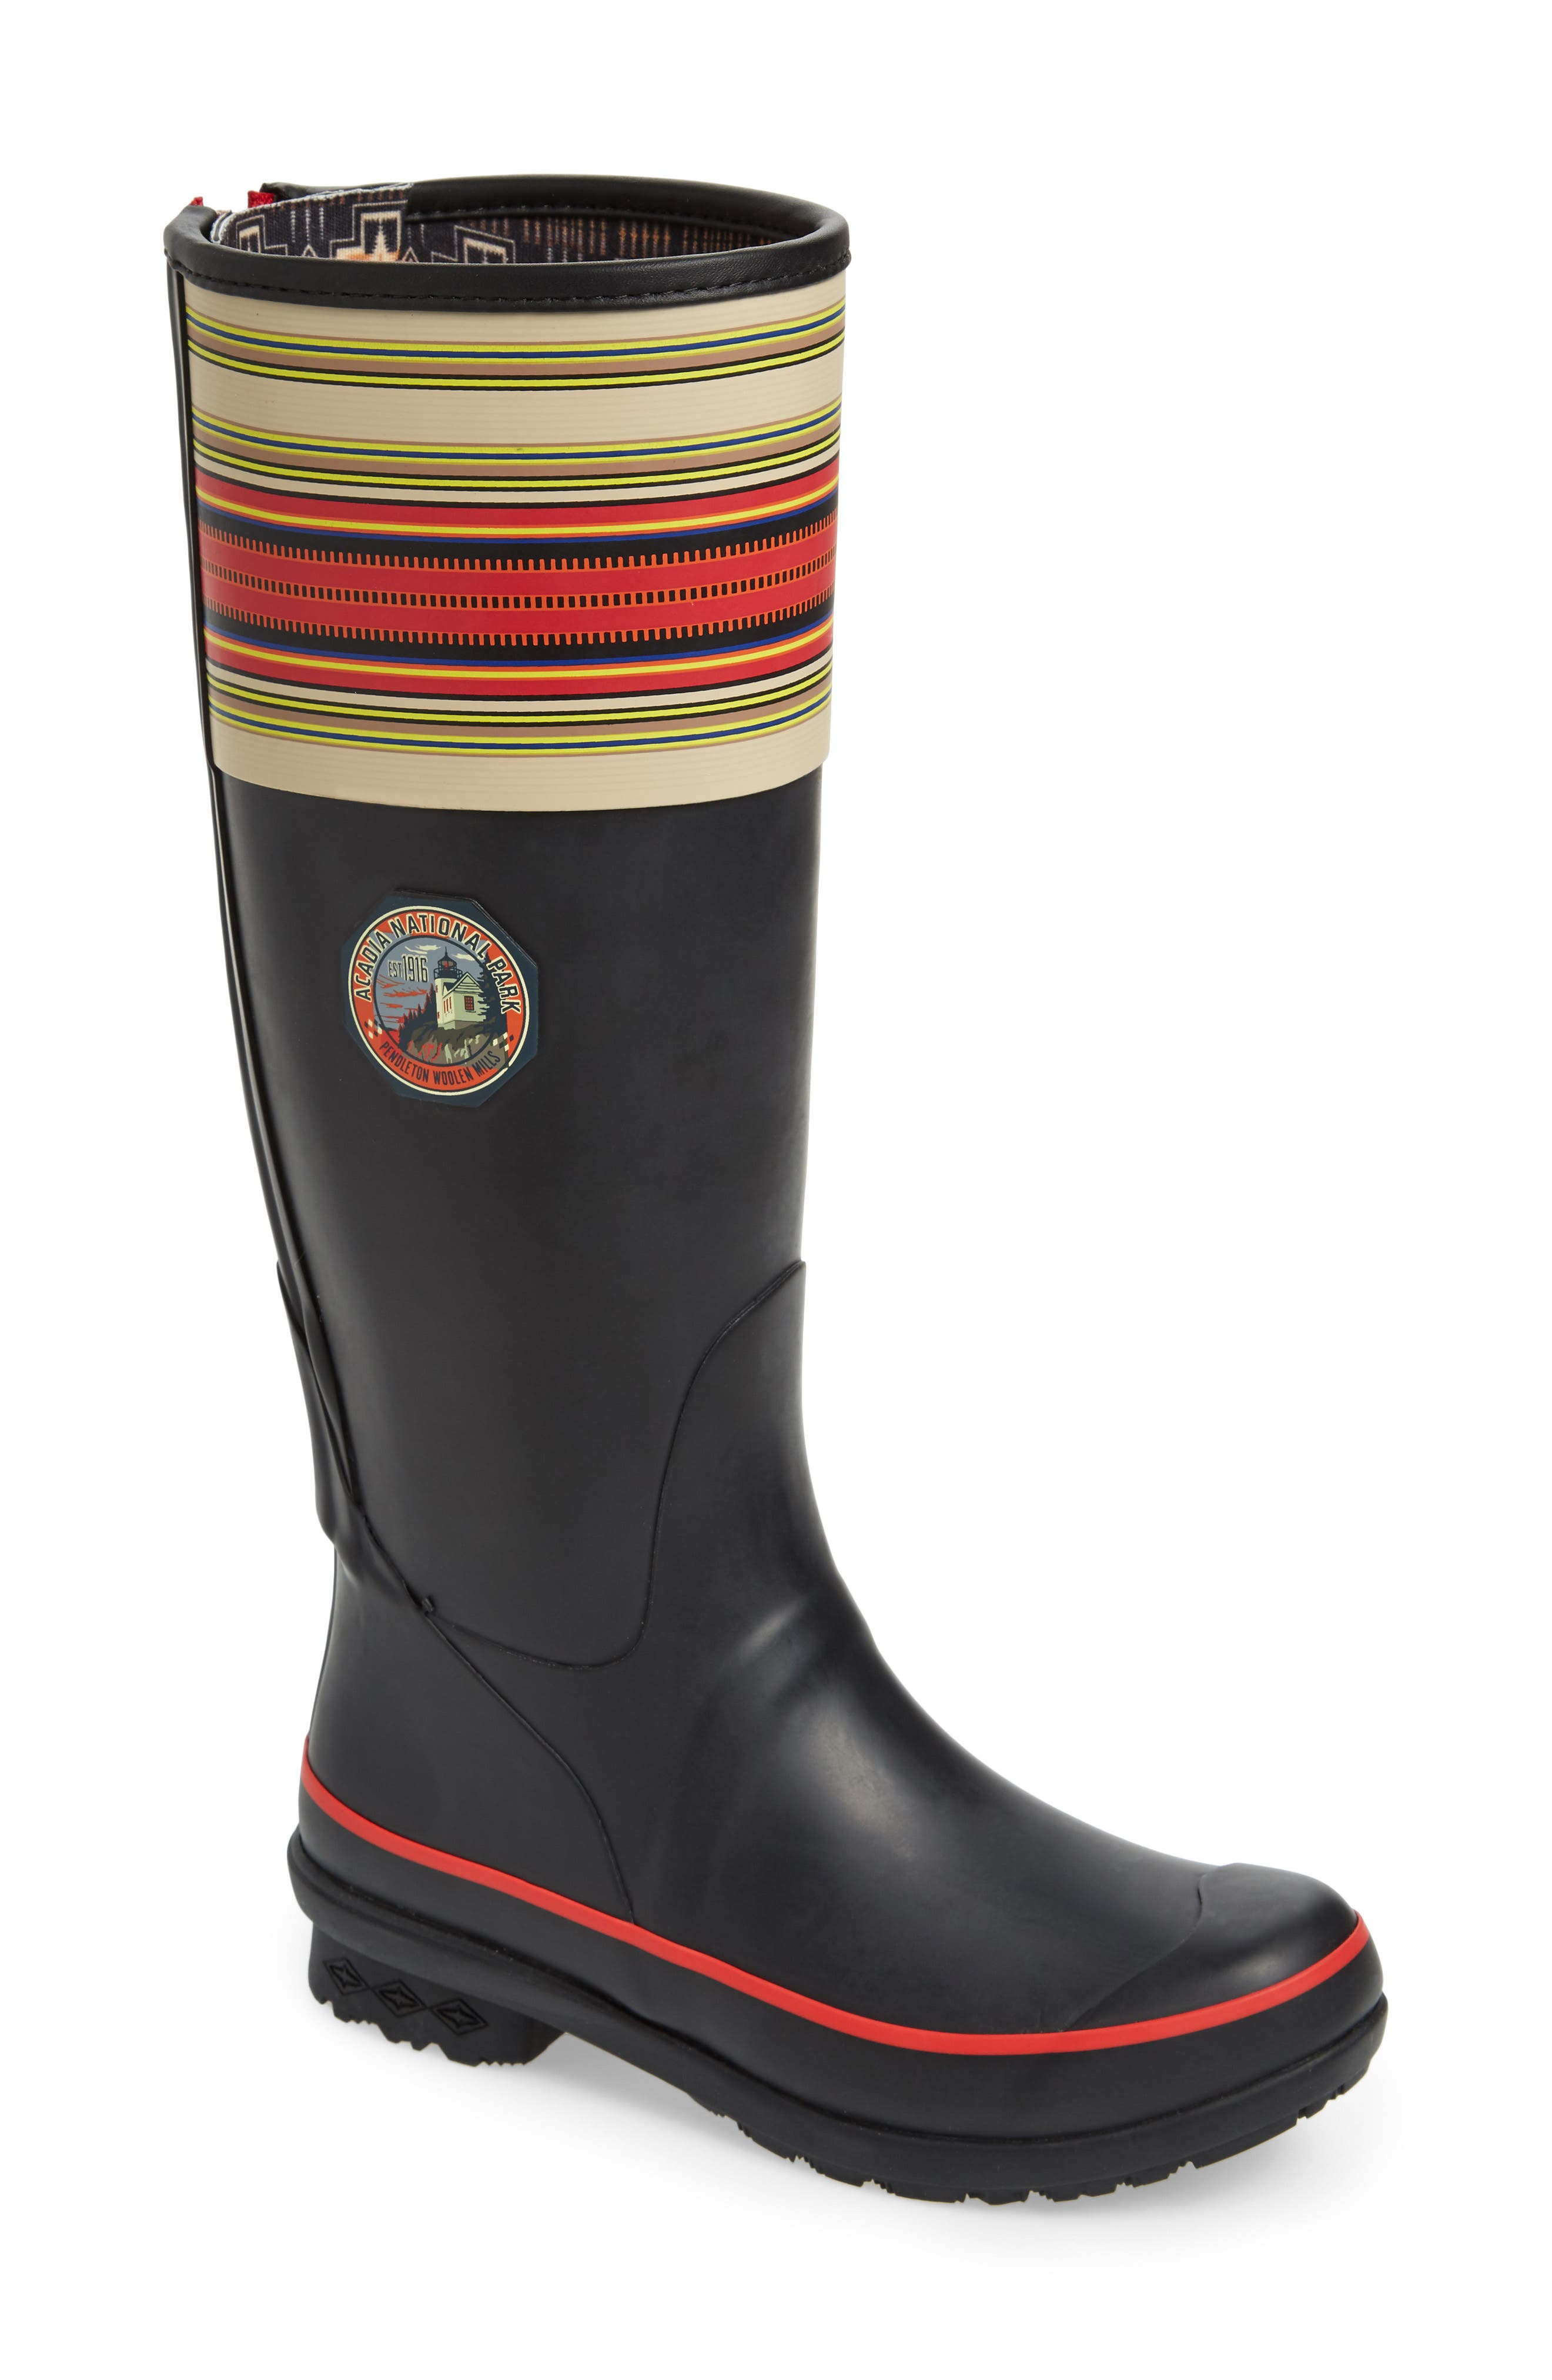 Pendleton Acadia National Park Tall Rain Boot,                         Main,                         color, BLACK